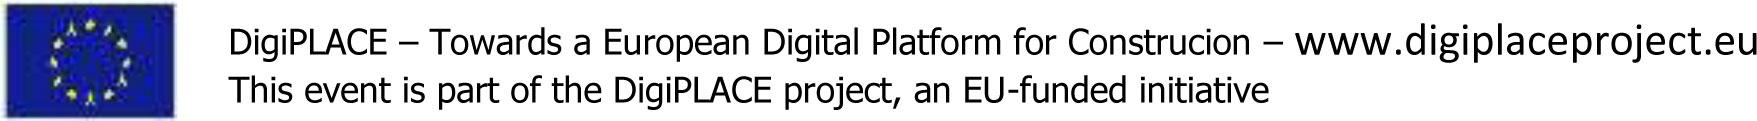 www.digiplaceproject.eu